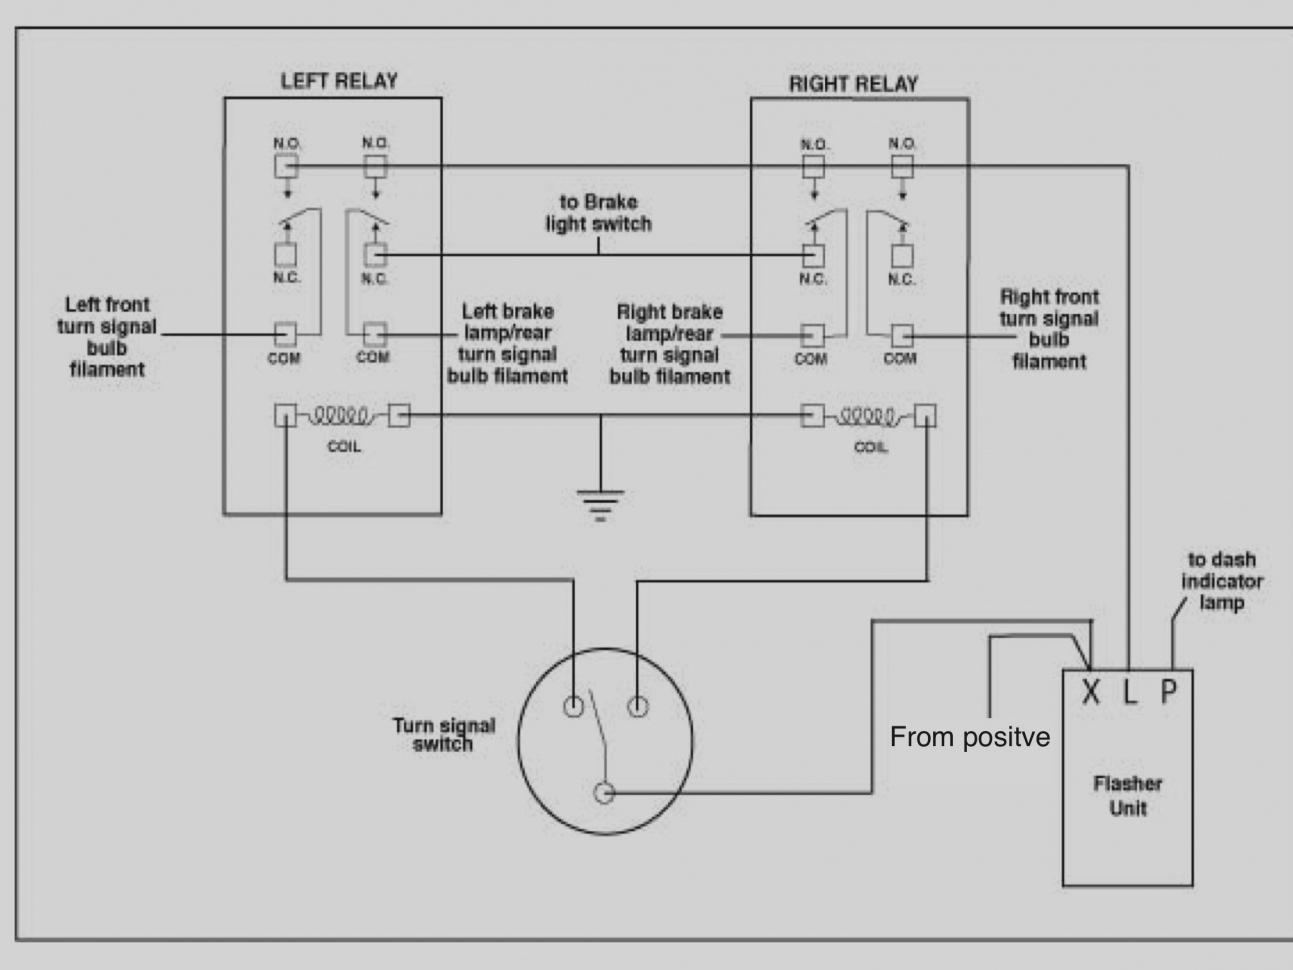 rzr xp wiring diagram wiring diagram table 08 Polaris RZR Wiring-Diagram